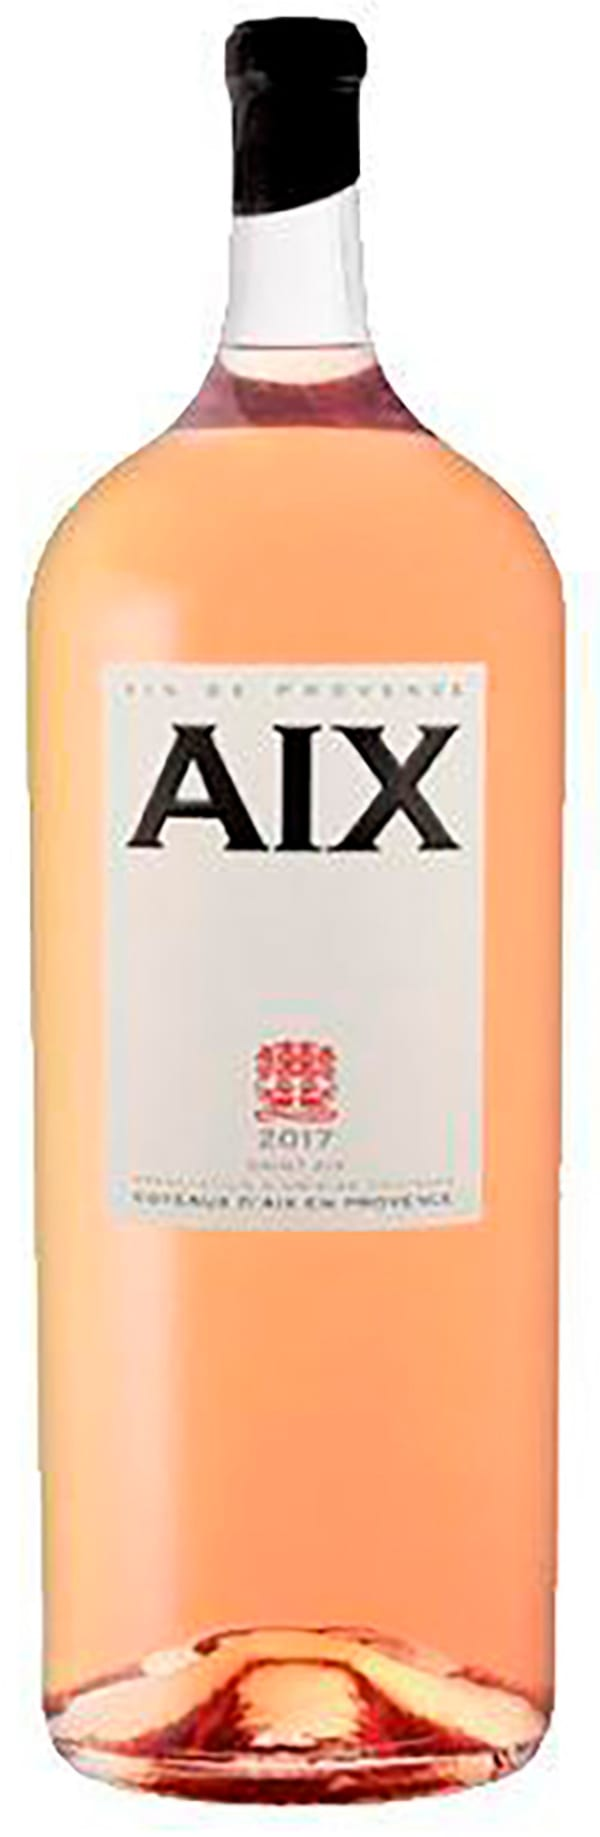 Aix Provence Rosé Mathusalem 2020